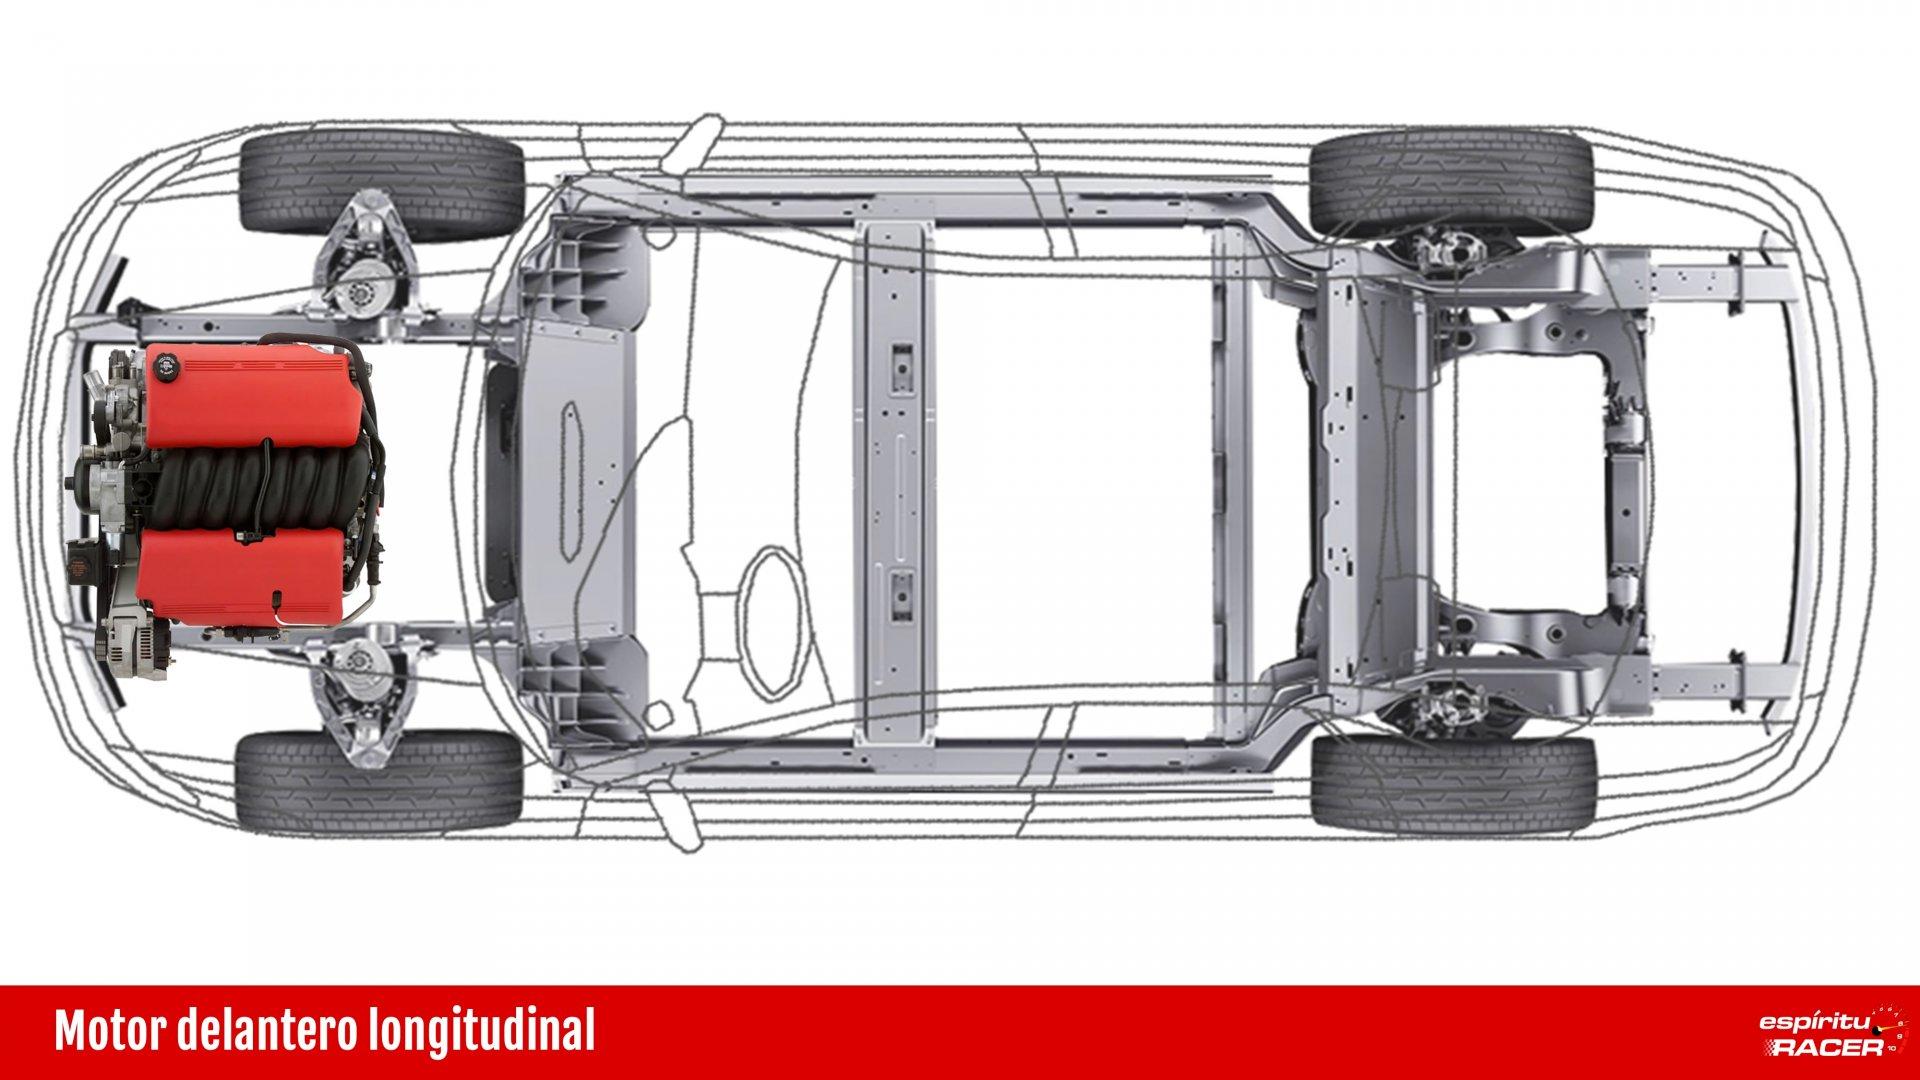 Motor delantero longitudinal